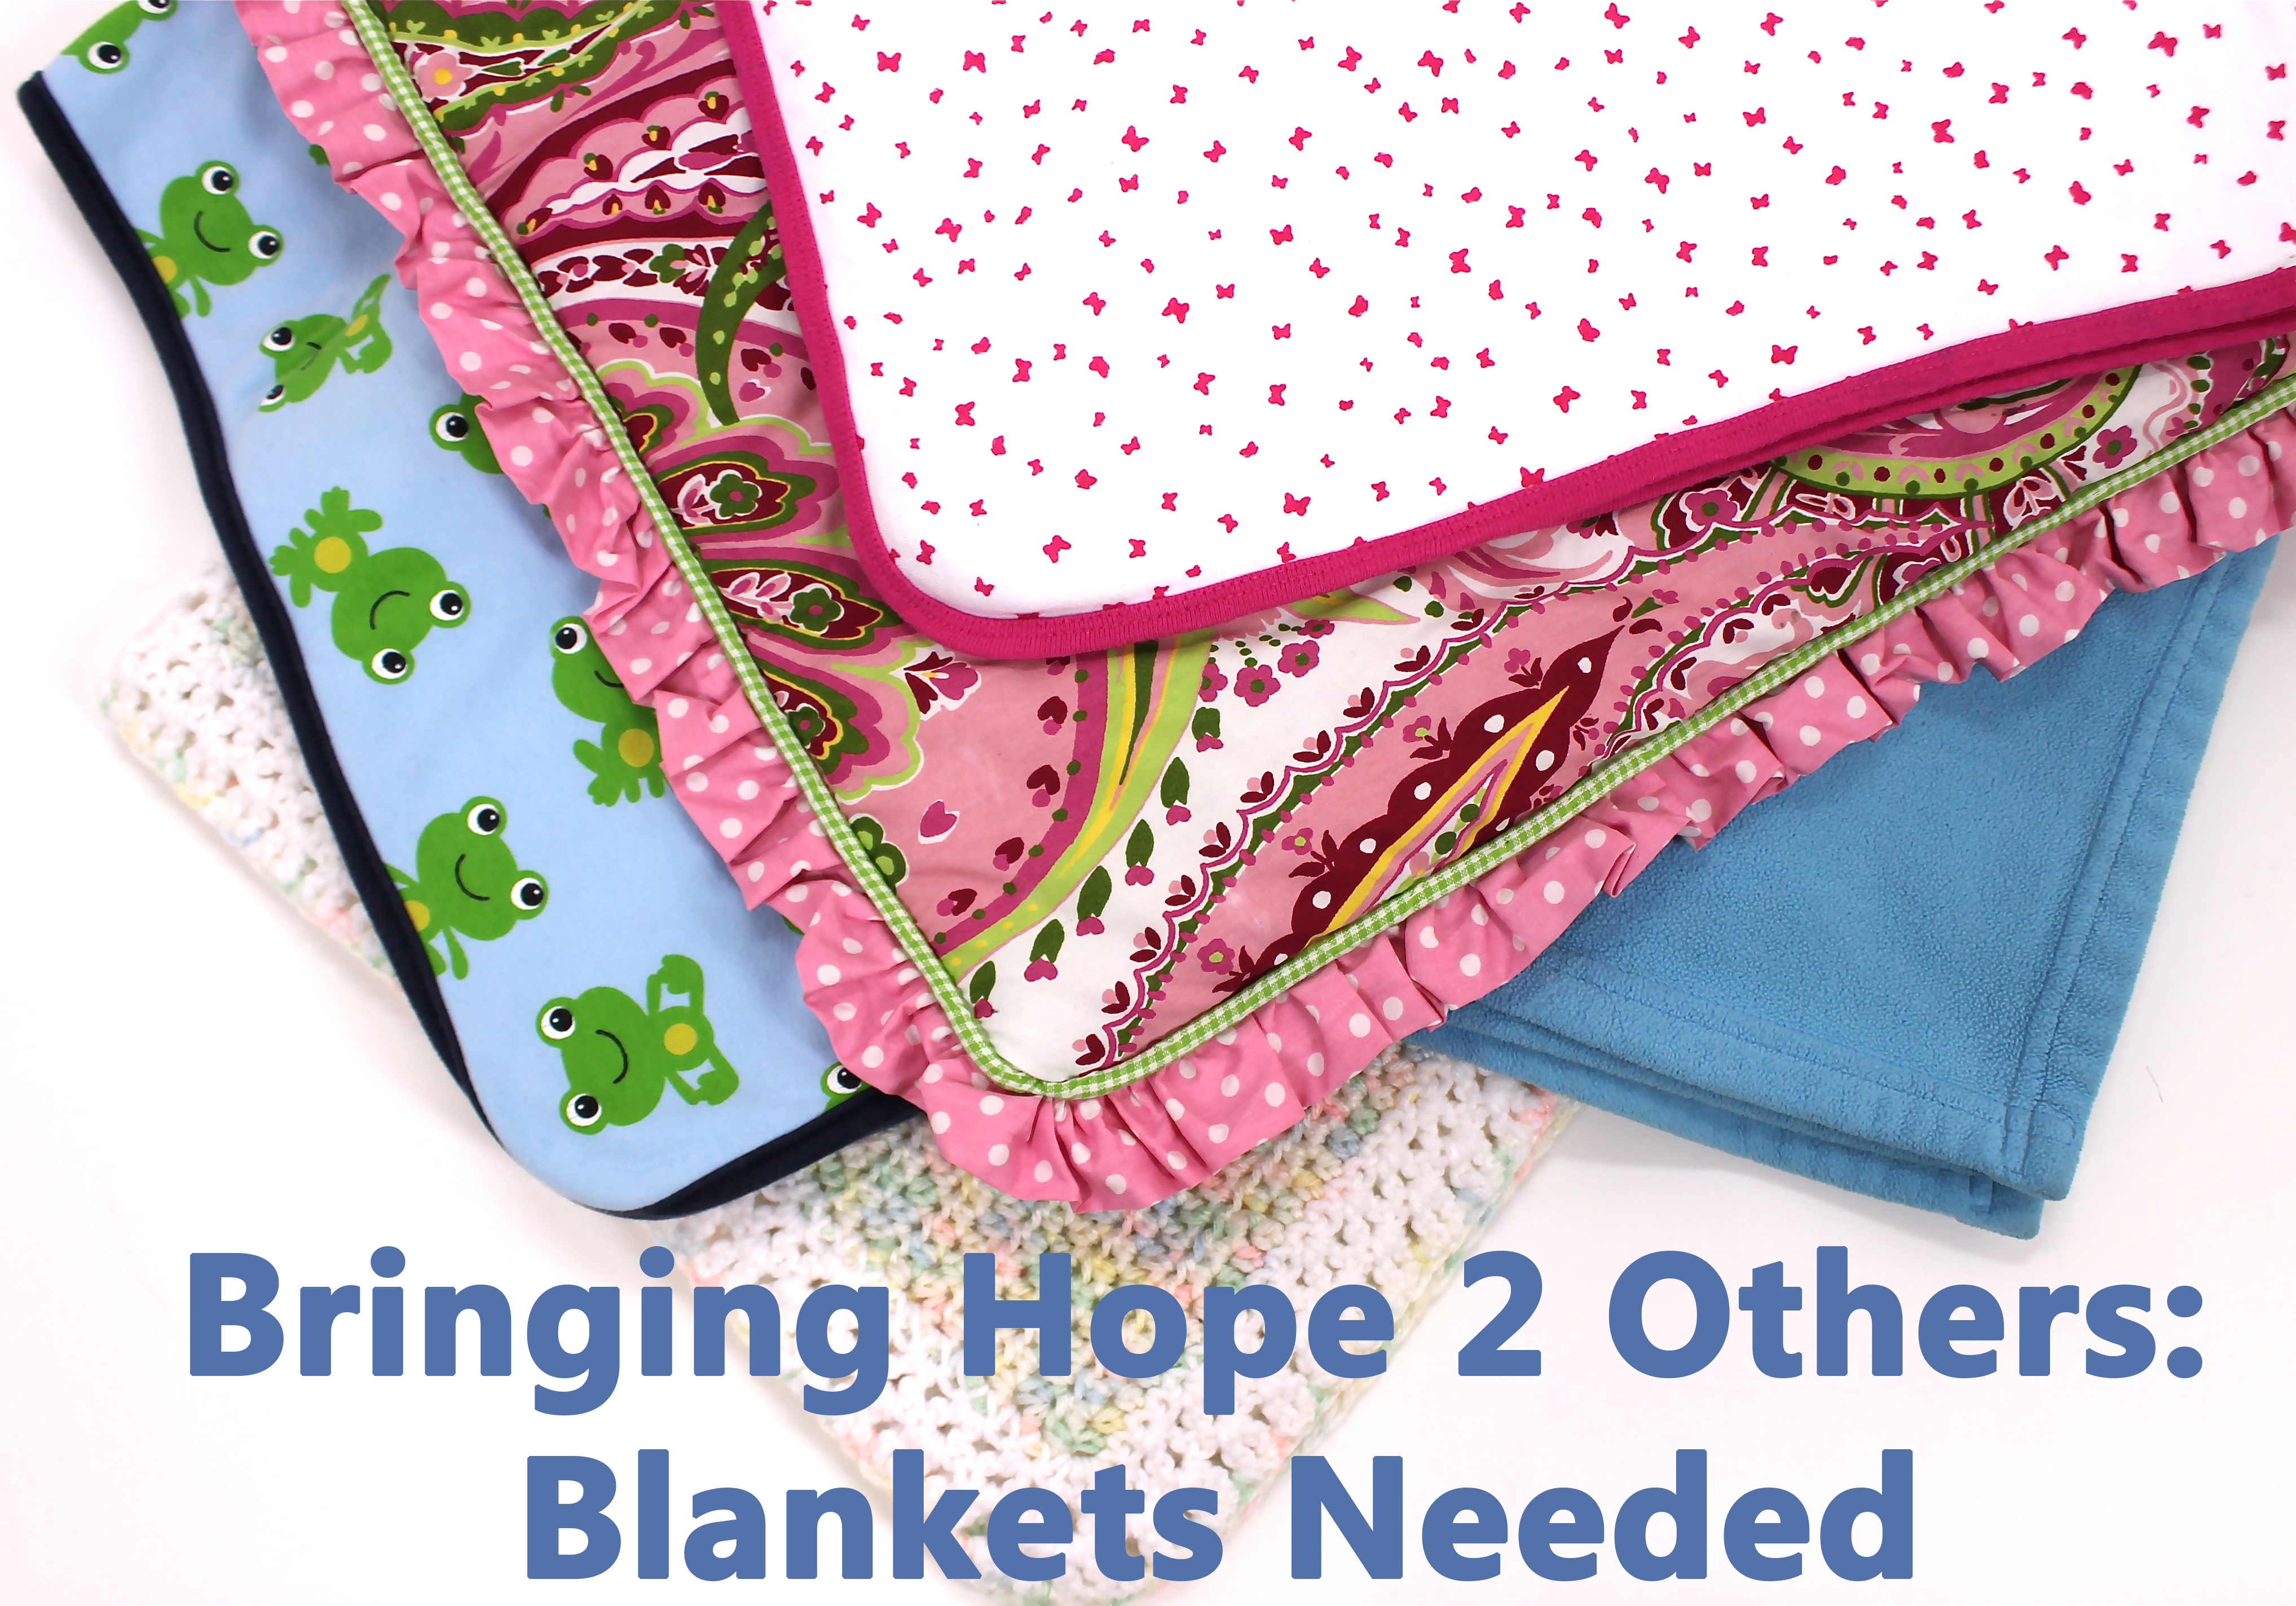 BlanketsNeeded